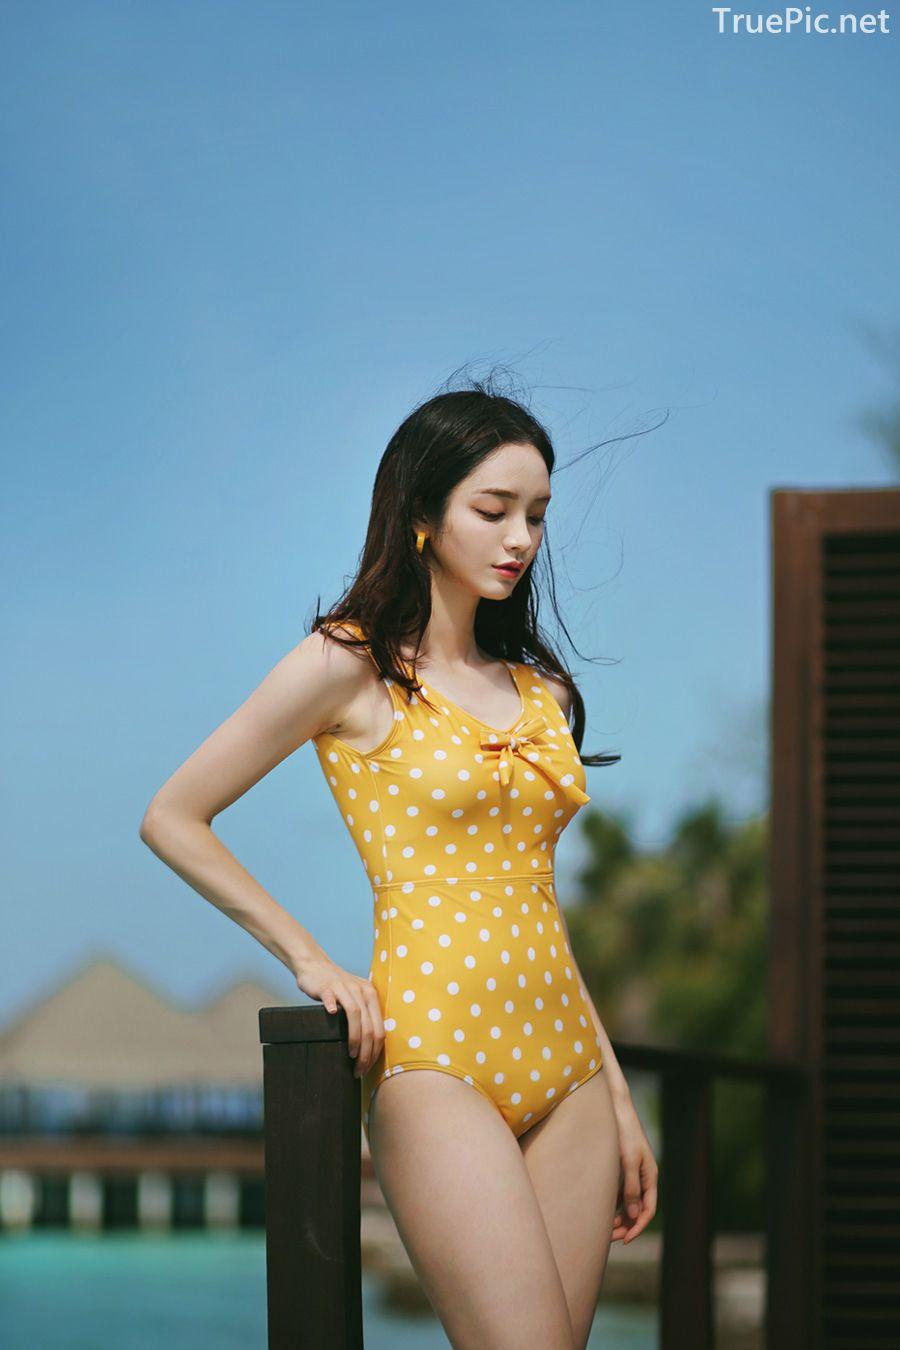 Korean fashion model Jeong Hee - Everyone once a monokini - Picture 6